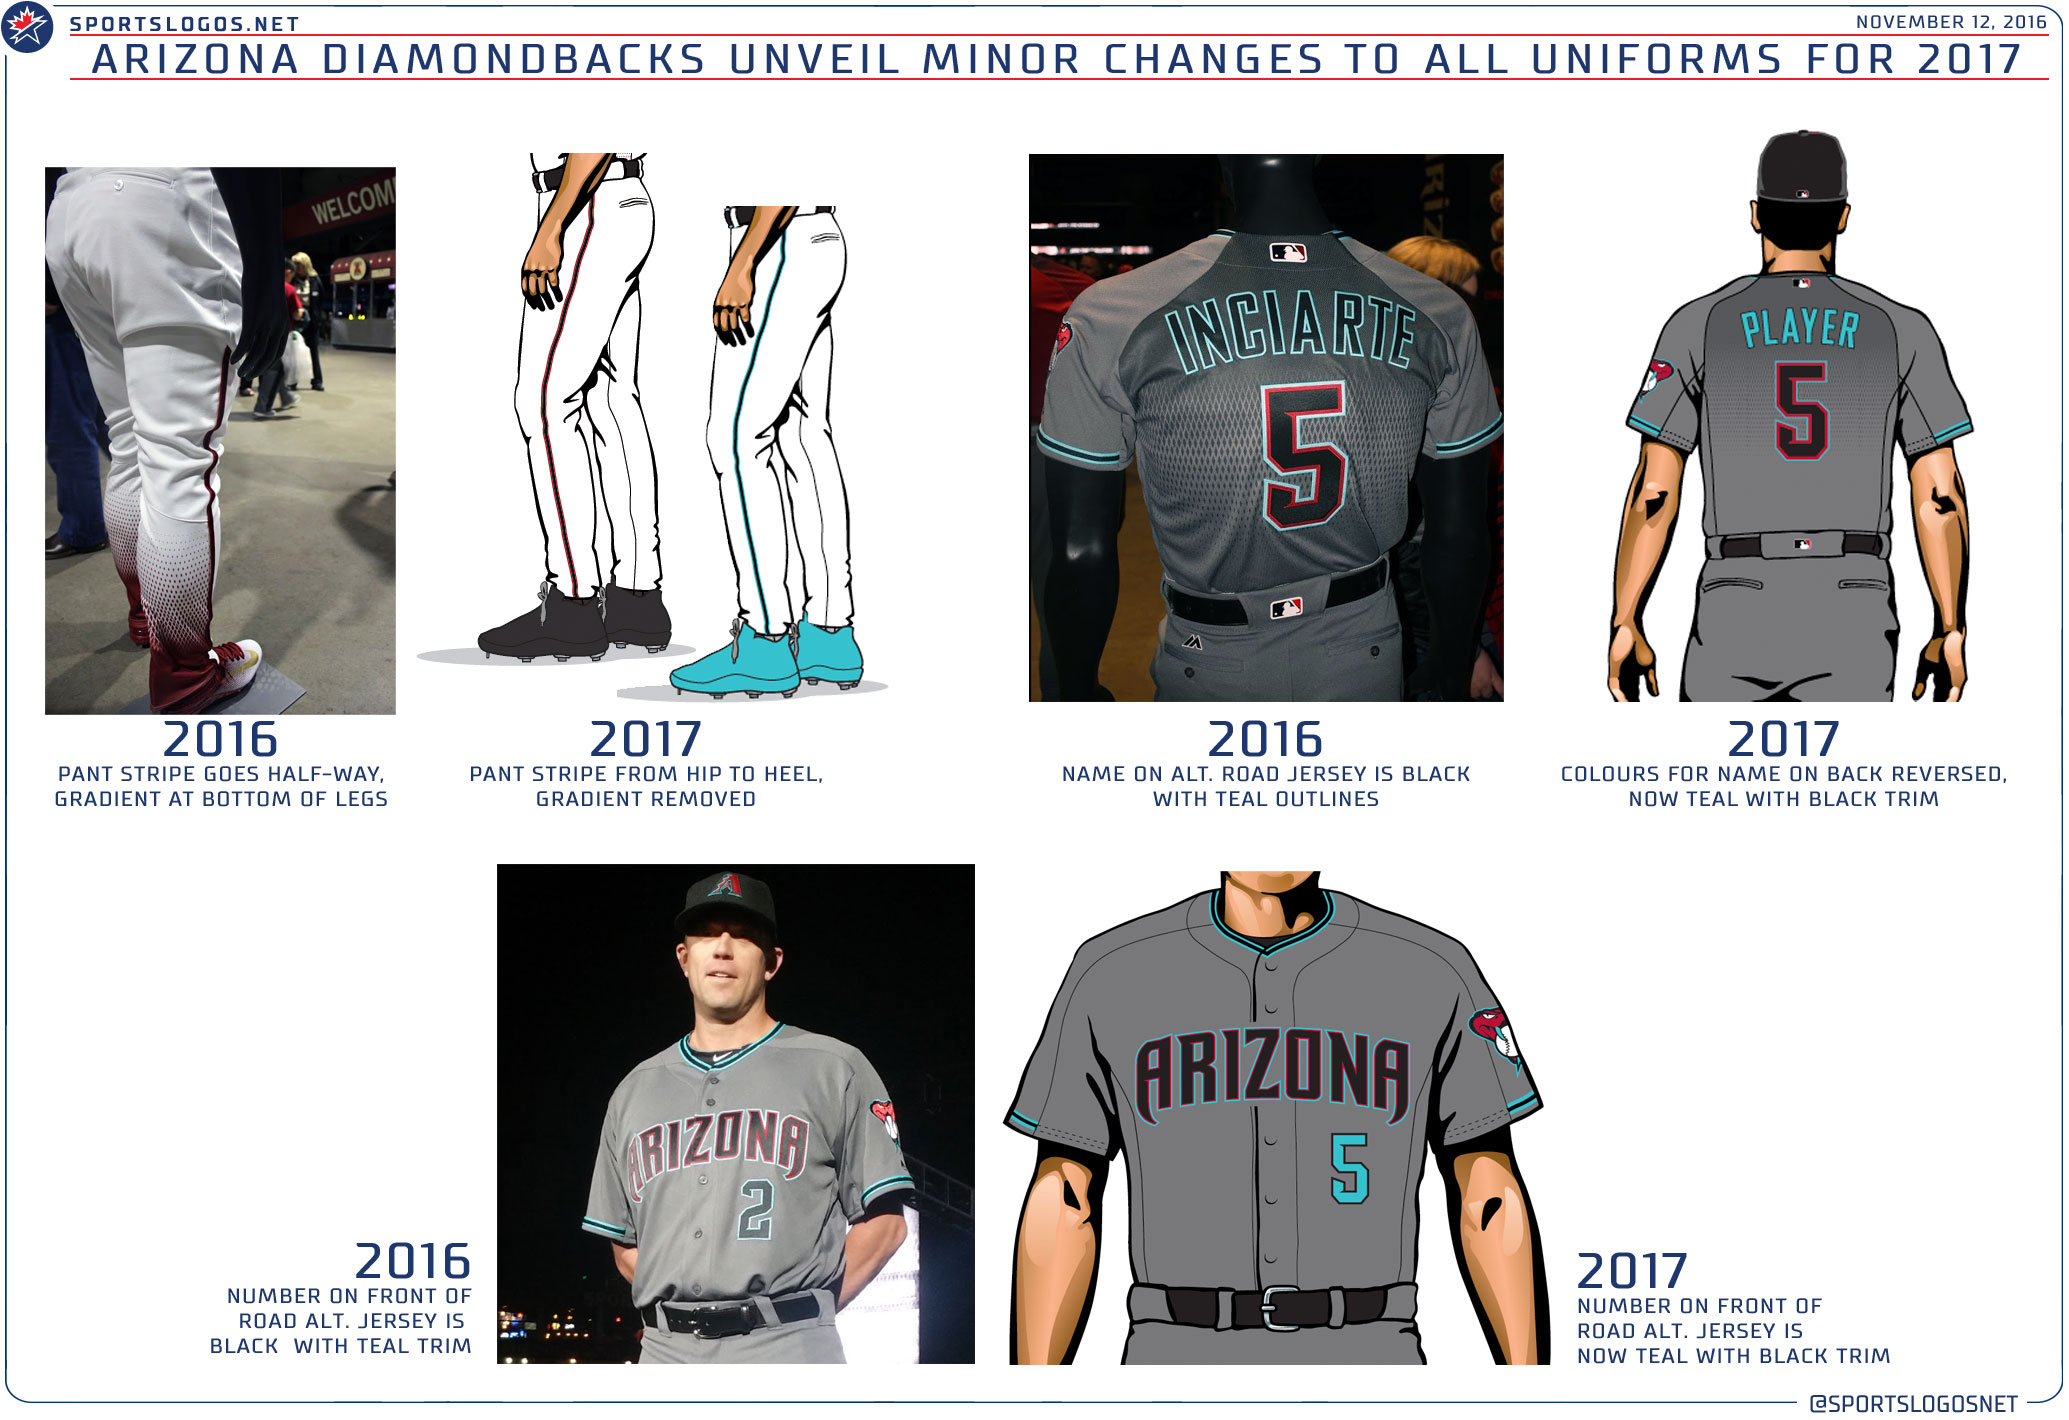 Arizona-Diamondbacks-New-Uniforms-2017.jpg